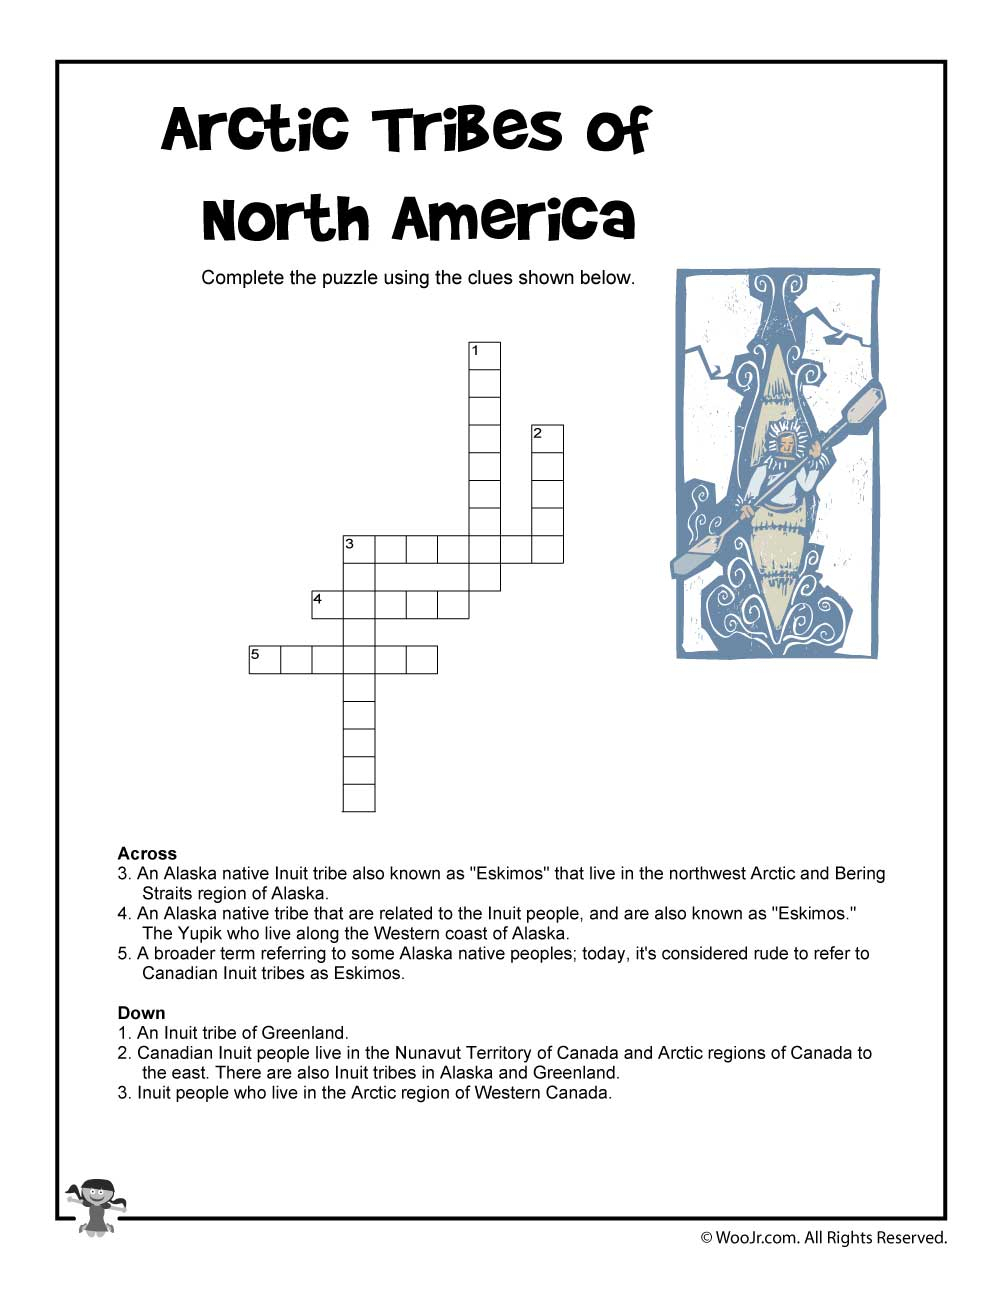 Arctic Tribes Of North America Crossword Puzzle | Woo! Jr. Kids - Native American Crossword Puzzle Printable